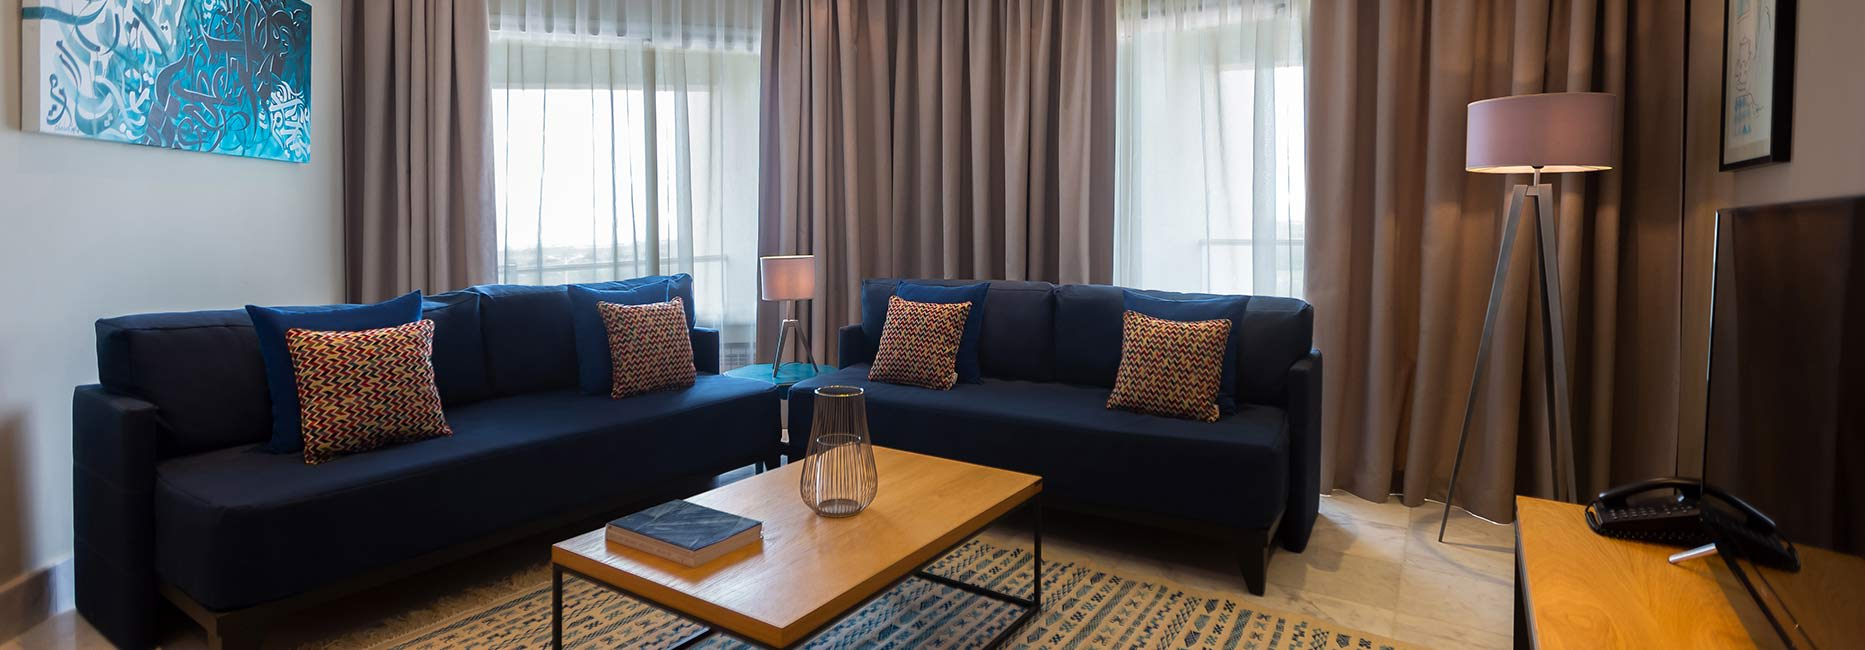 Avani One Bedroom Suite Living Room at Avani Les Berges du Lac Tunis Suites